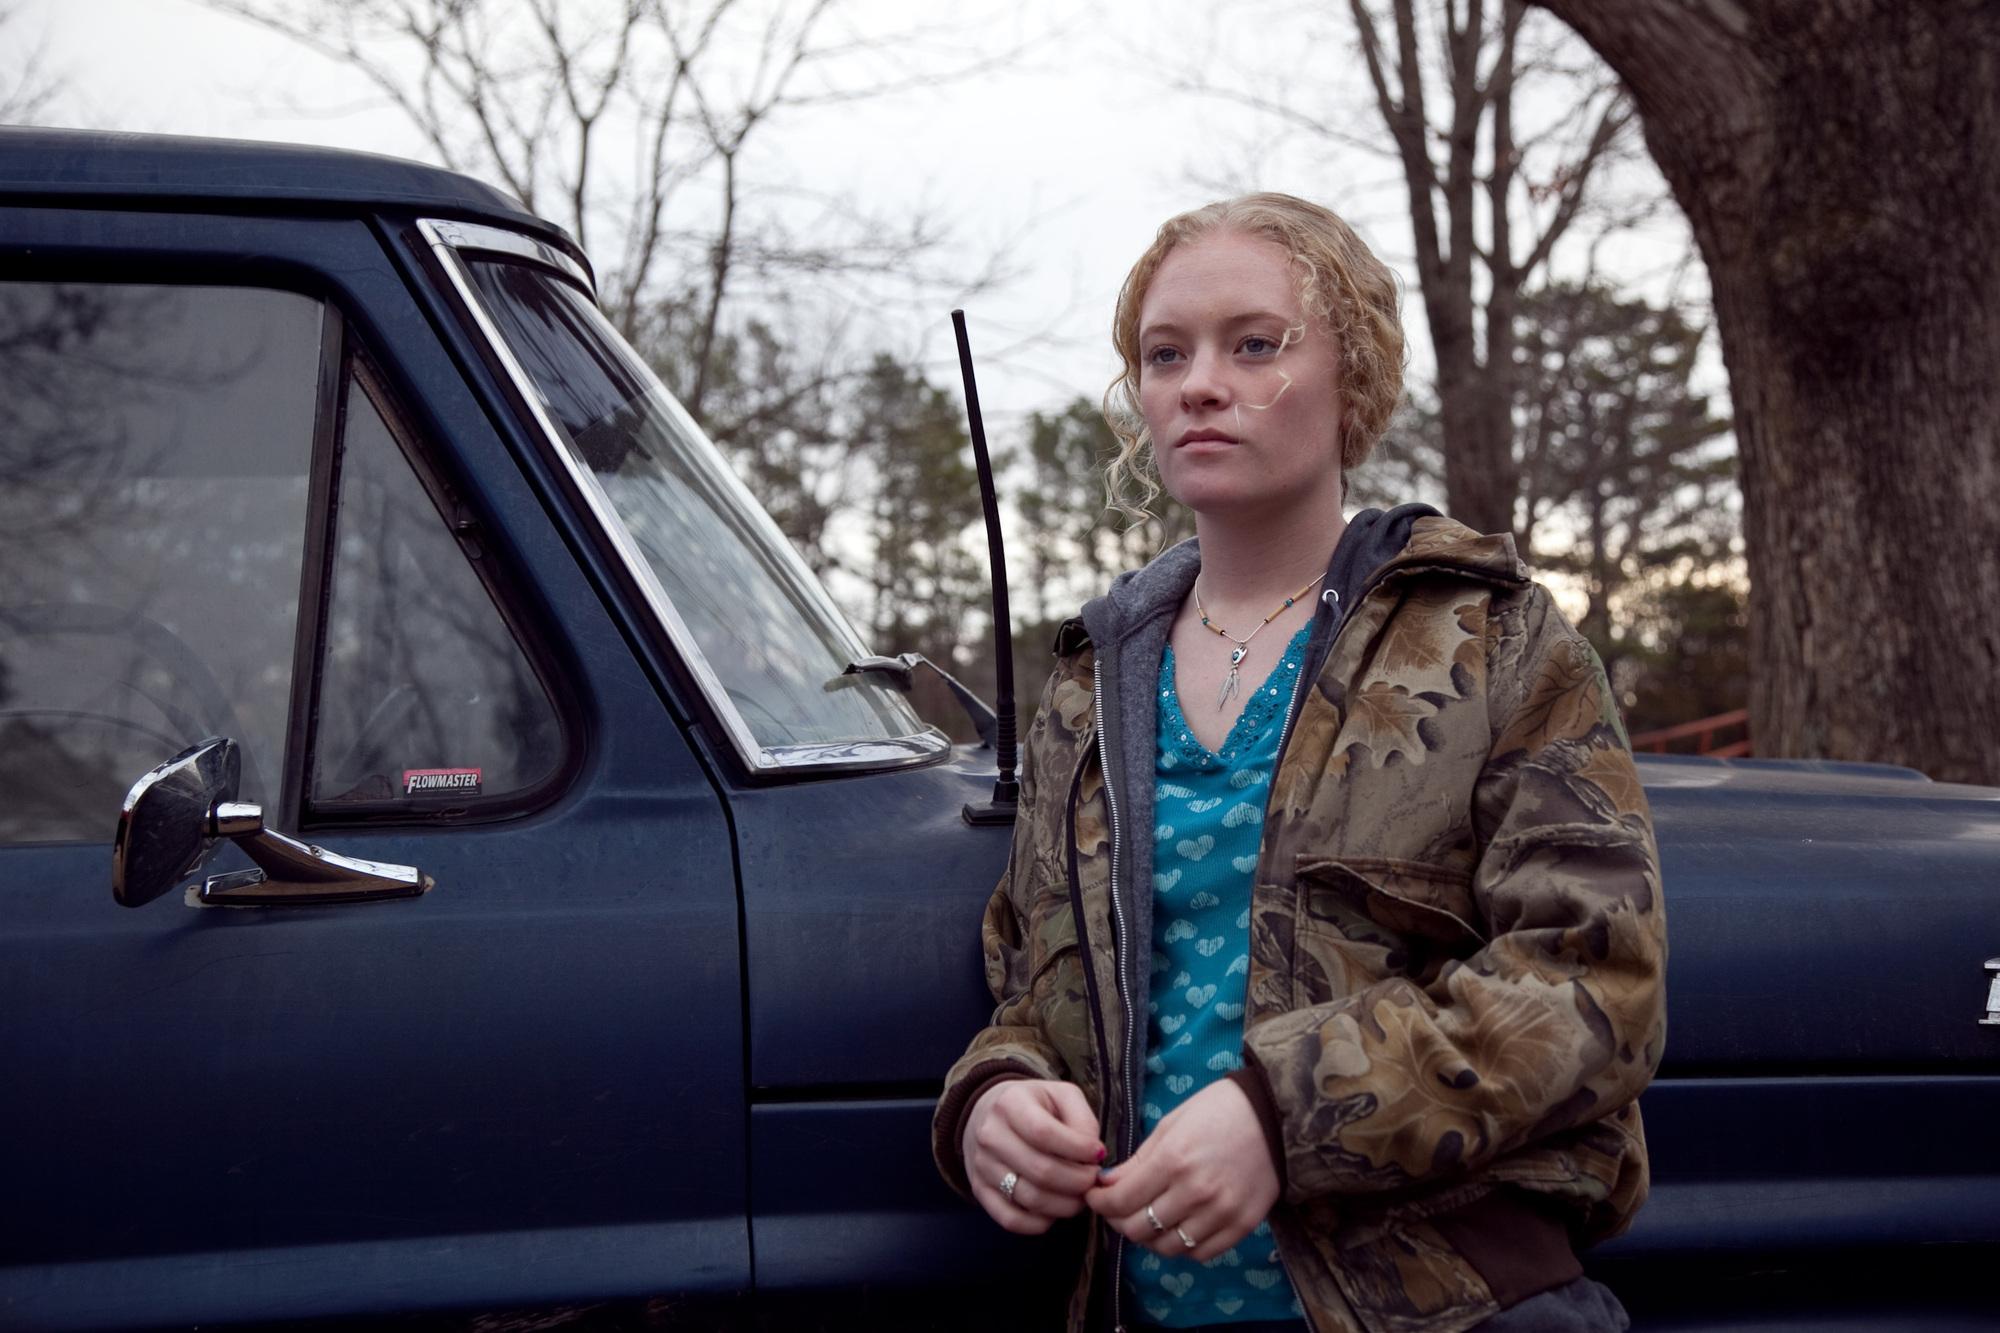 Lauren Sweetser as Gail stars in 'Winter's Bone,' directed by Debra Granik.